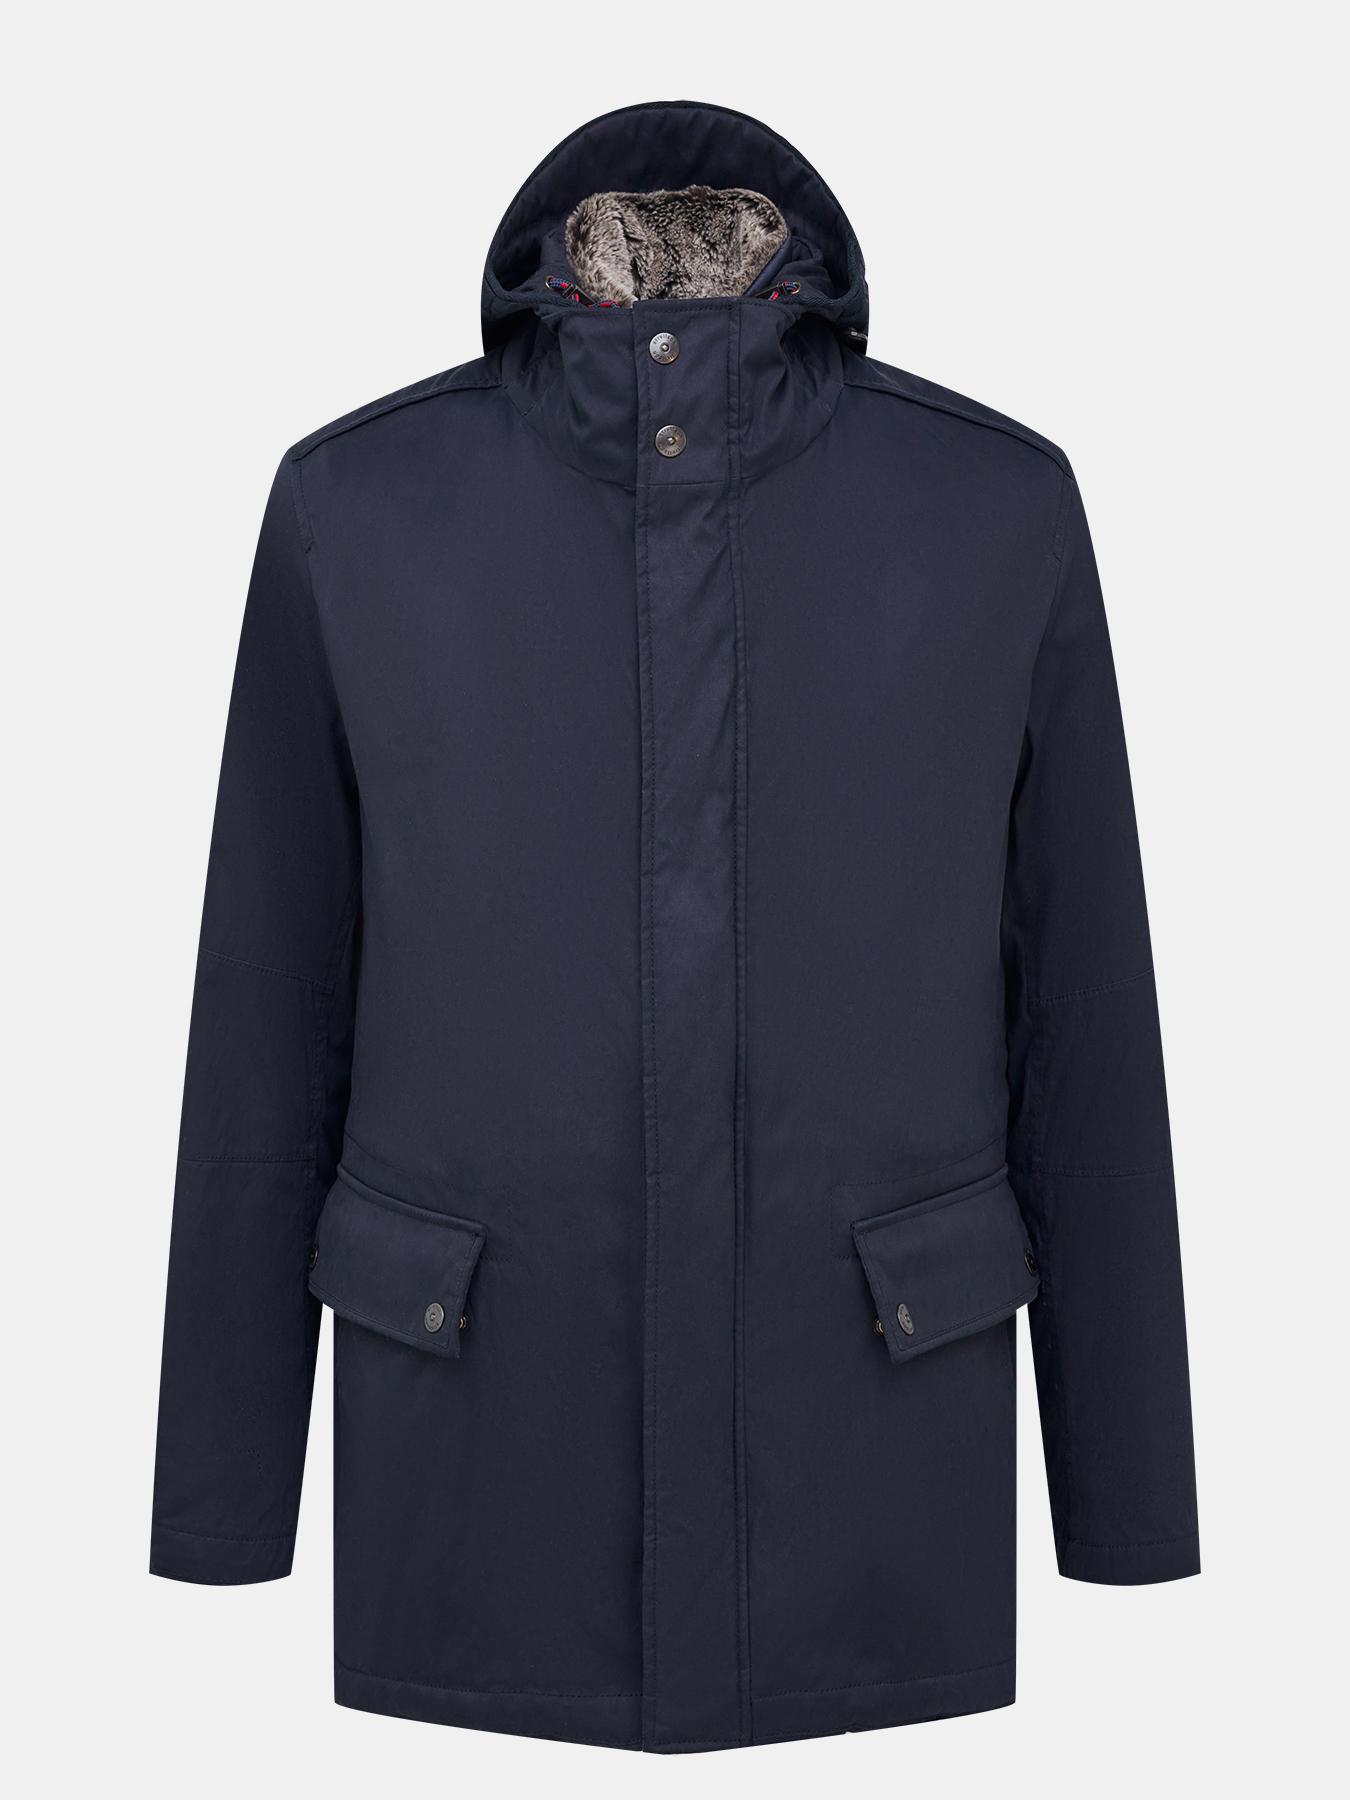 Куртки Strellson Куртка 2 в 1 куртка утепленная strellson strellson st004emfvky5